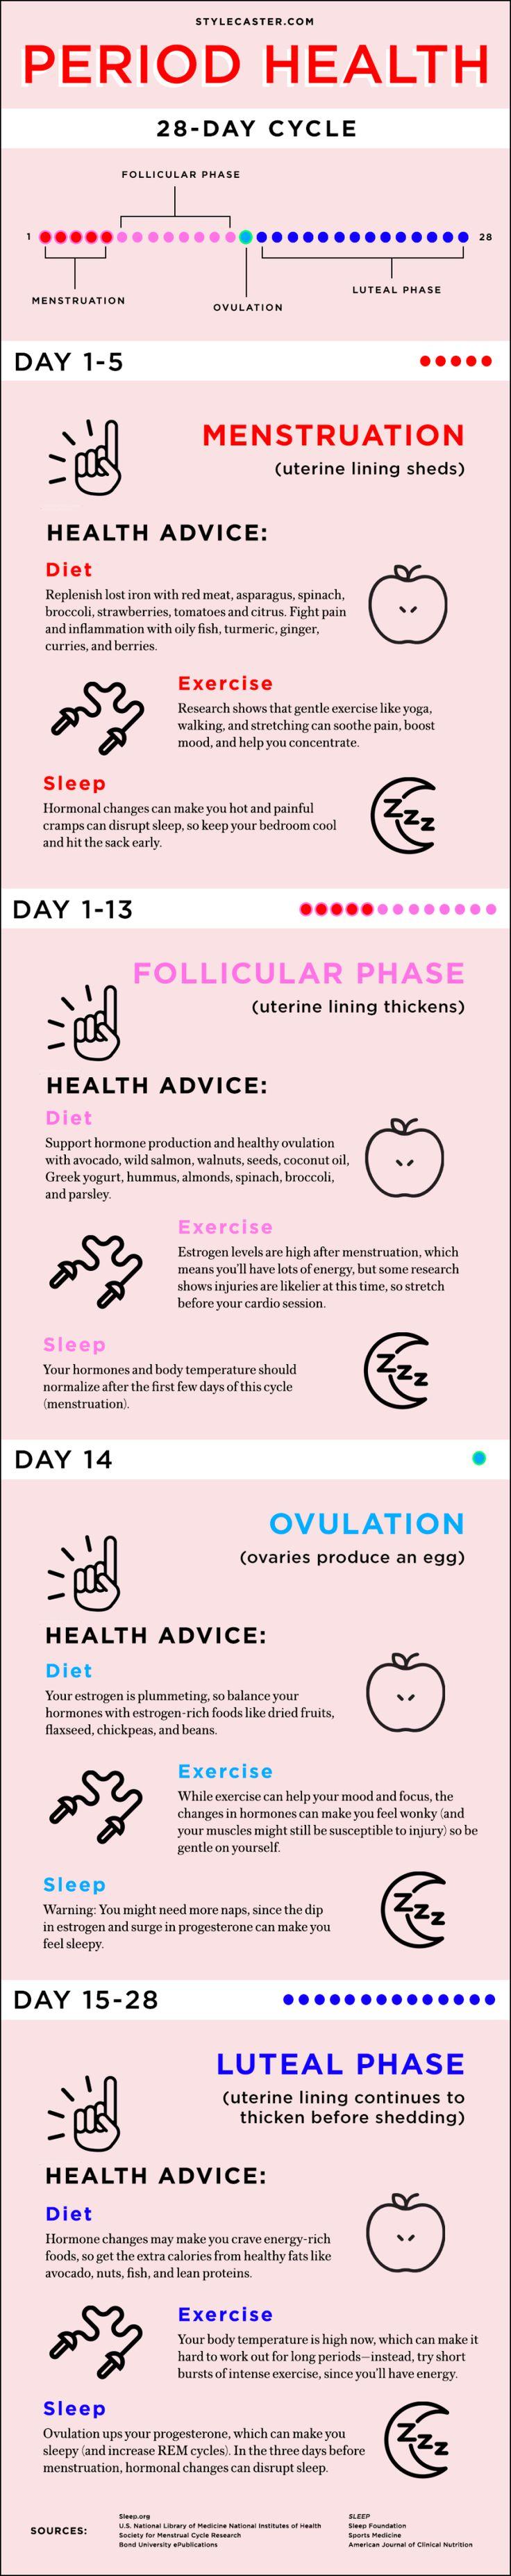 Period Health